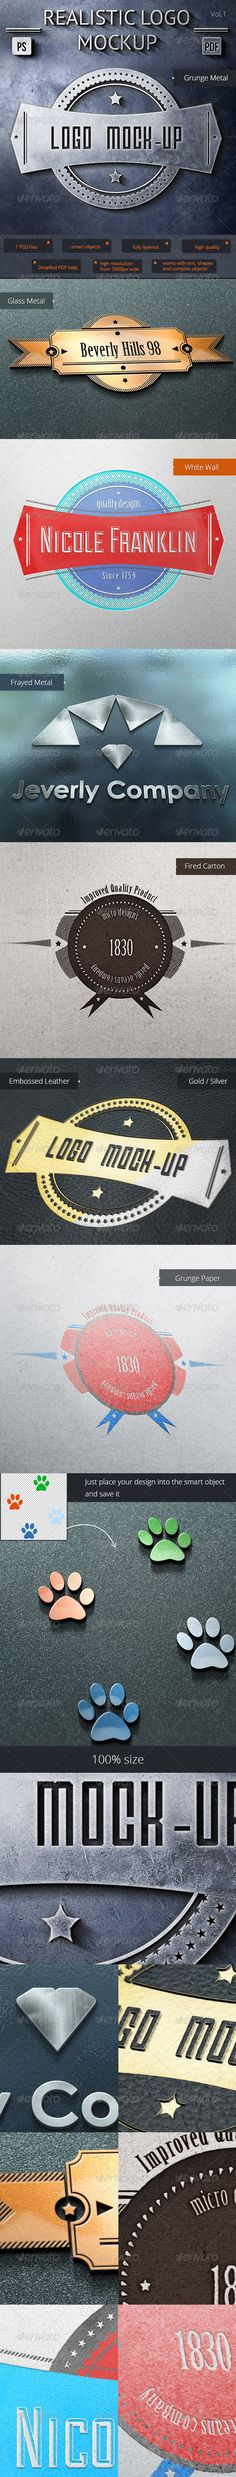 7 Realistic Logo Mock-Up Vol.1 - Logo Product Mock-Ups